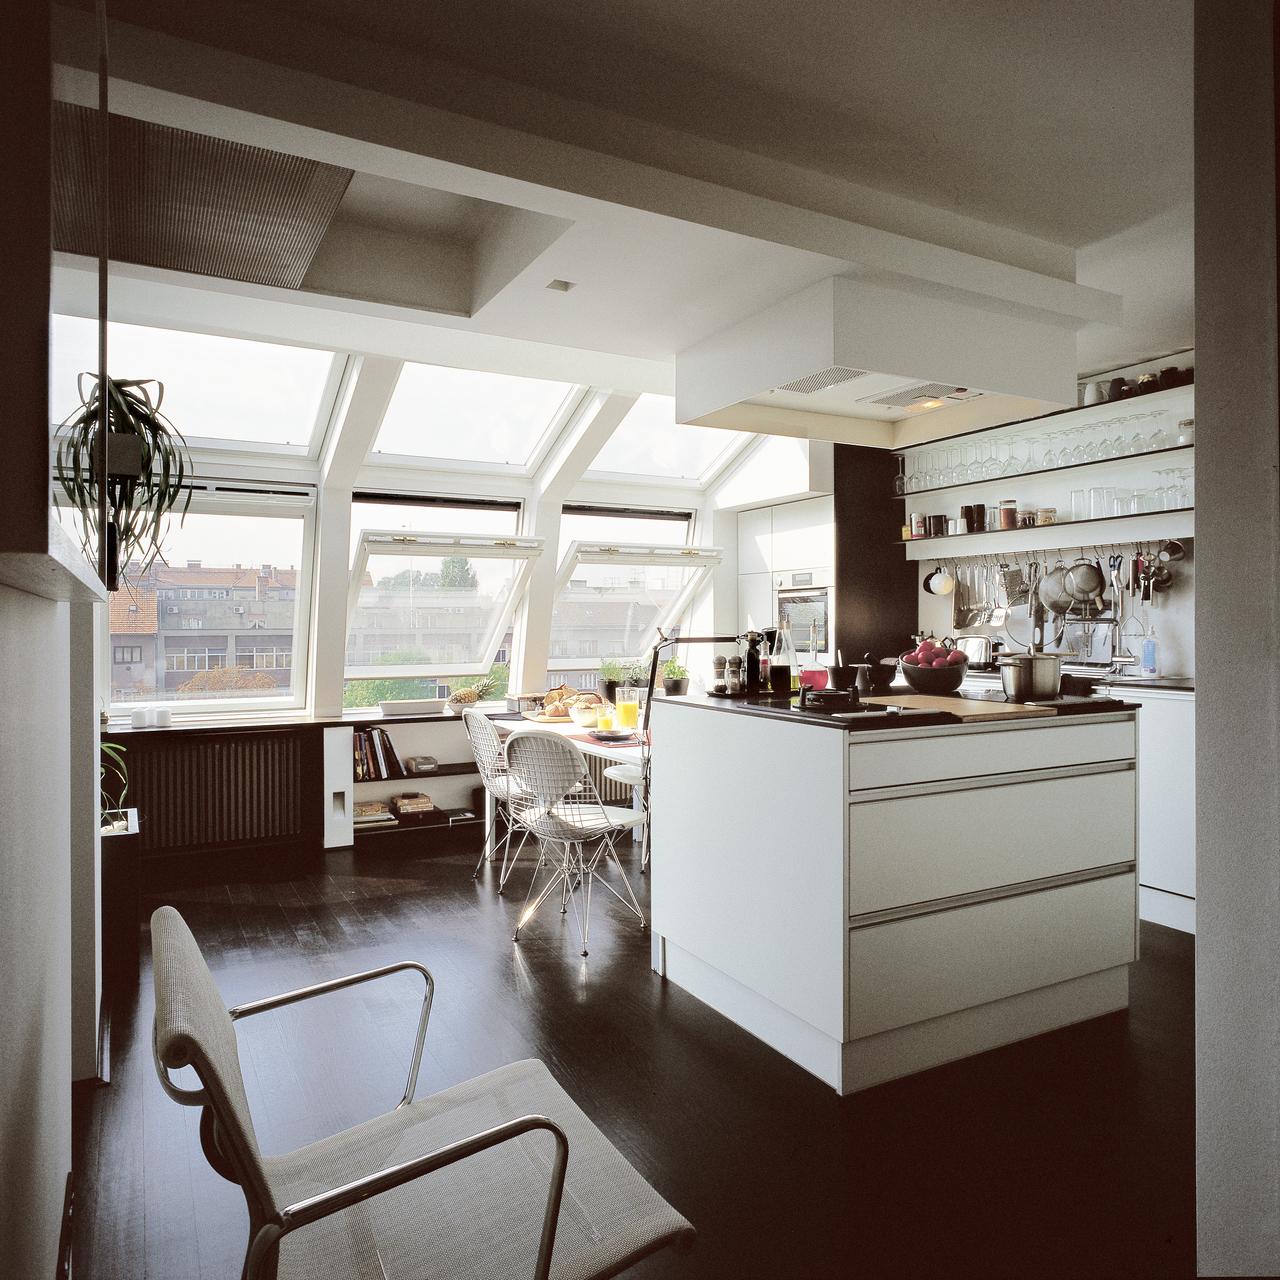 Cucine con isola in mansarda - Cucine con finestra ...